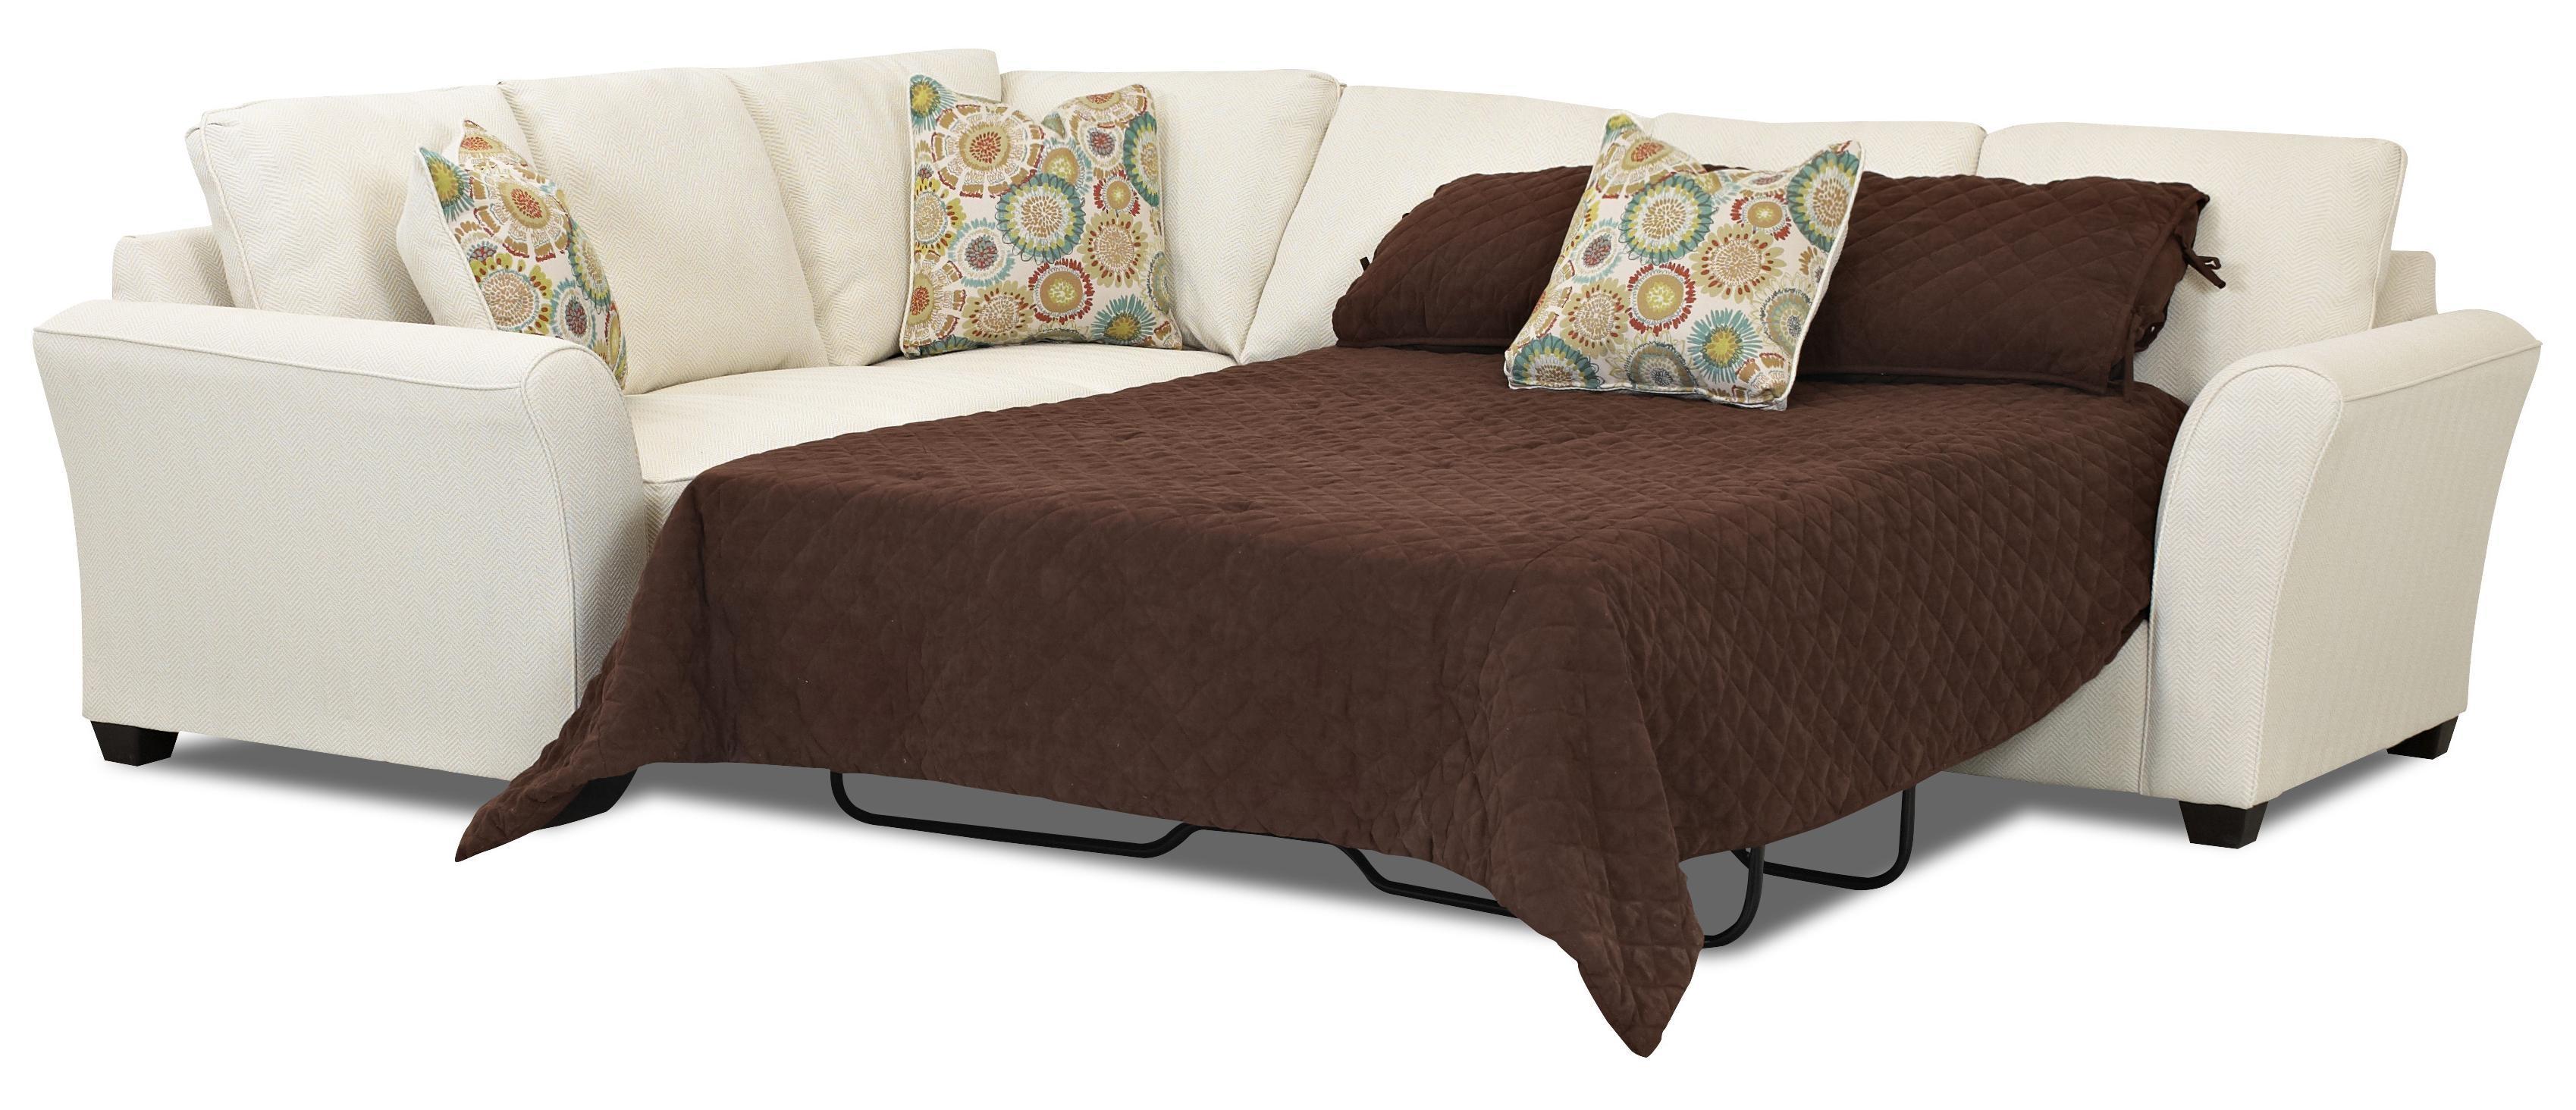 Sofas Center : Queen Sleeper Sofa Cover Mattress Replacement Within Sleeper Sofas Mattress Covers (Image 15 of 20)